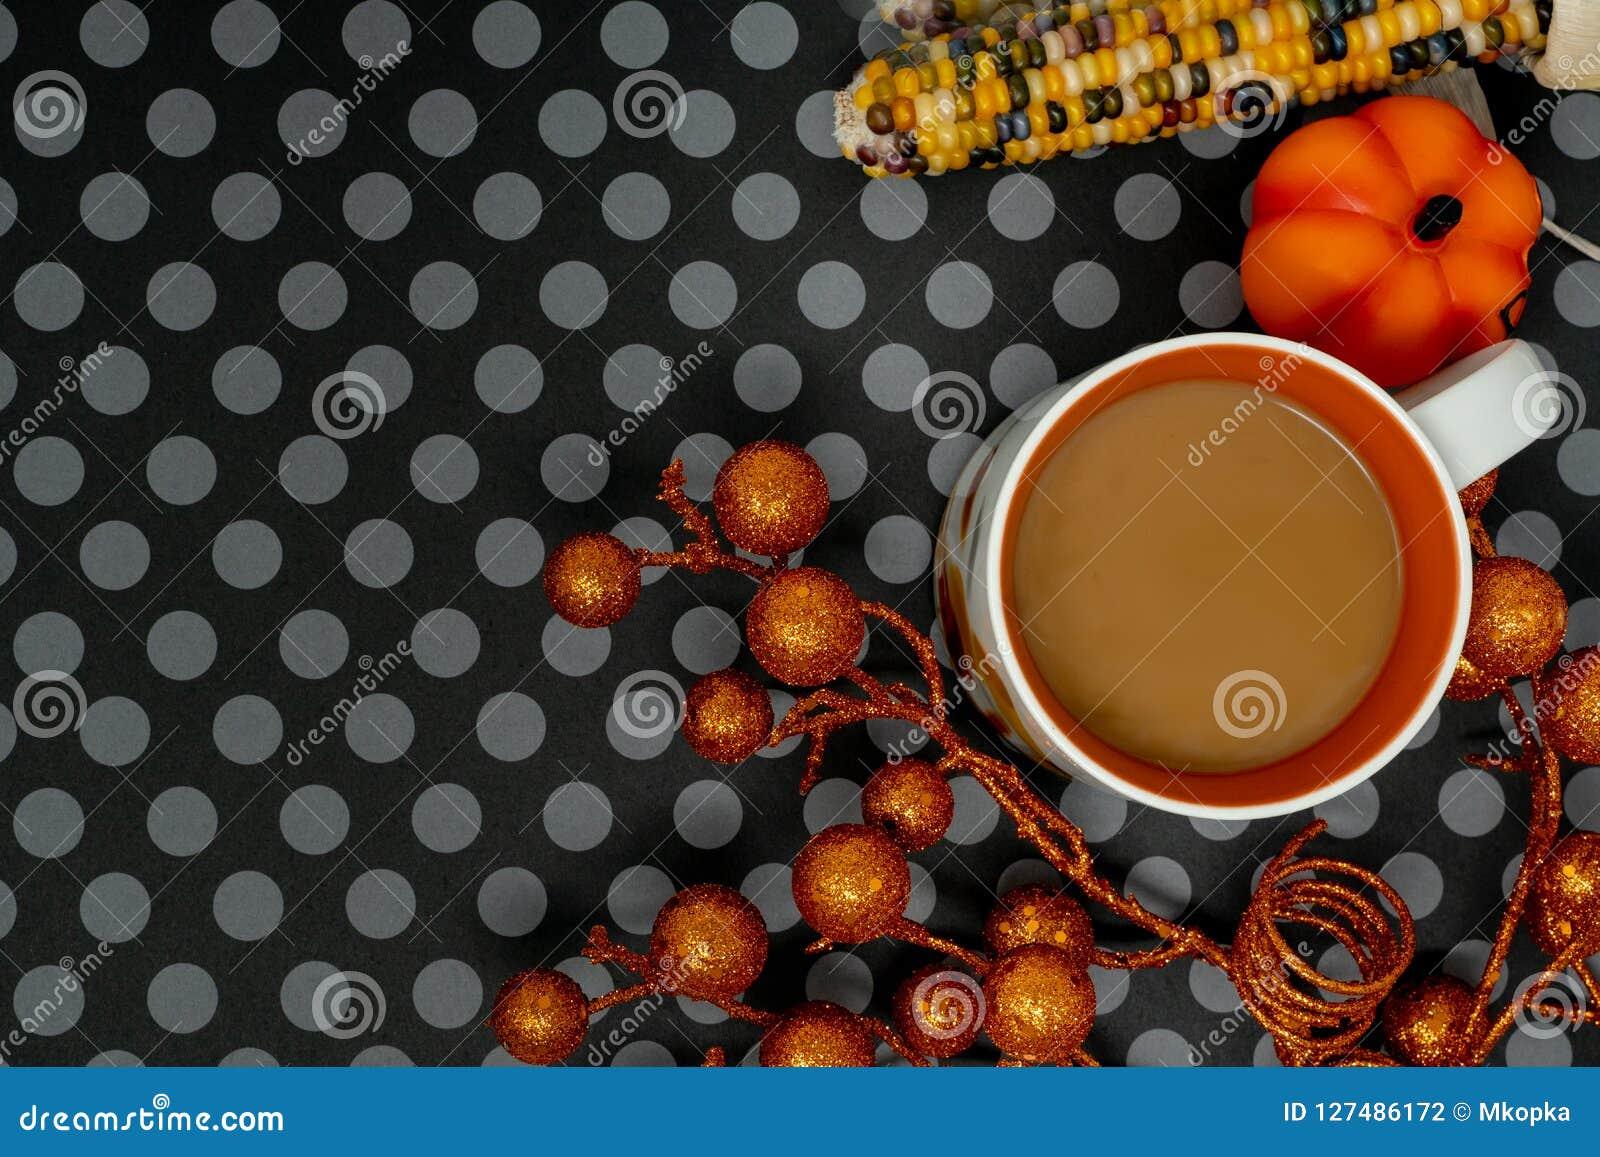 fun halloween background arrangement flat lay with coffee mug and